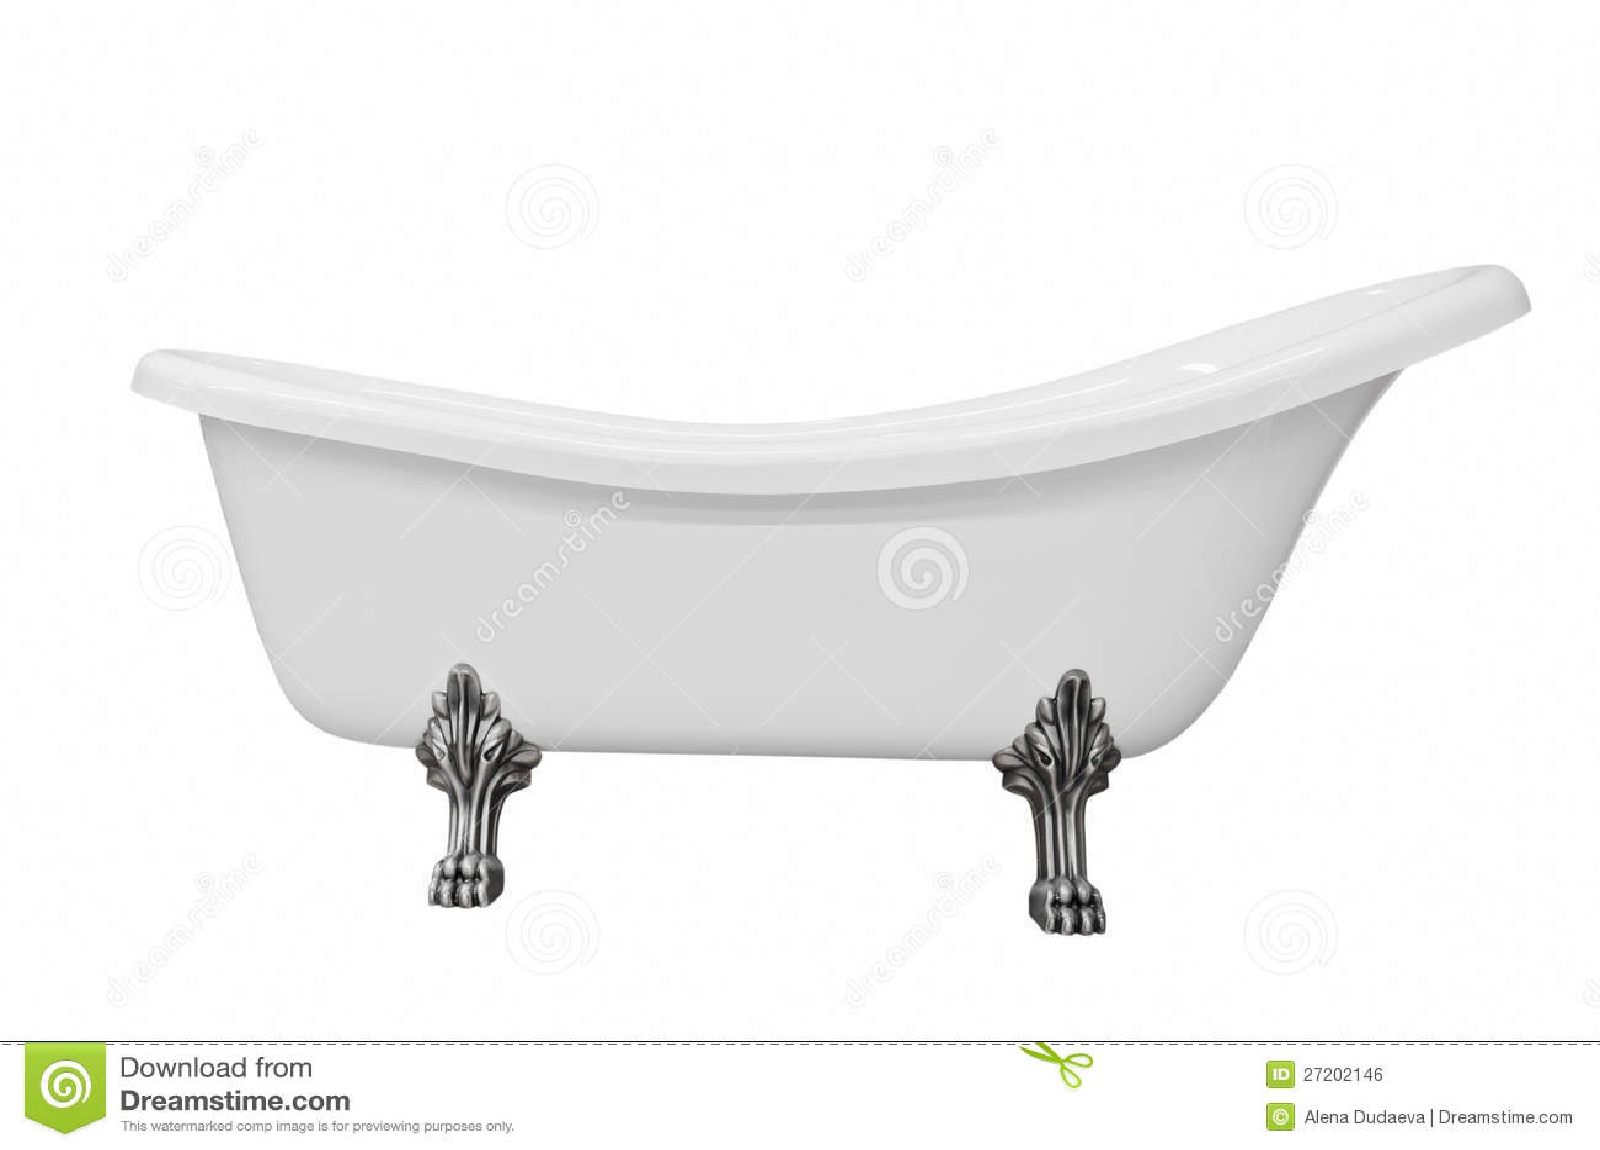 Classic White Bathtub With Legs Stock Image - Image of liquid ...